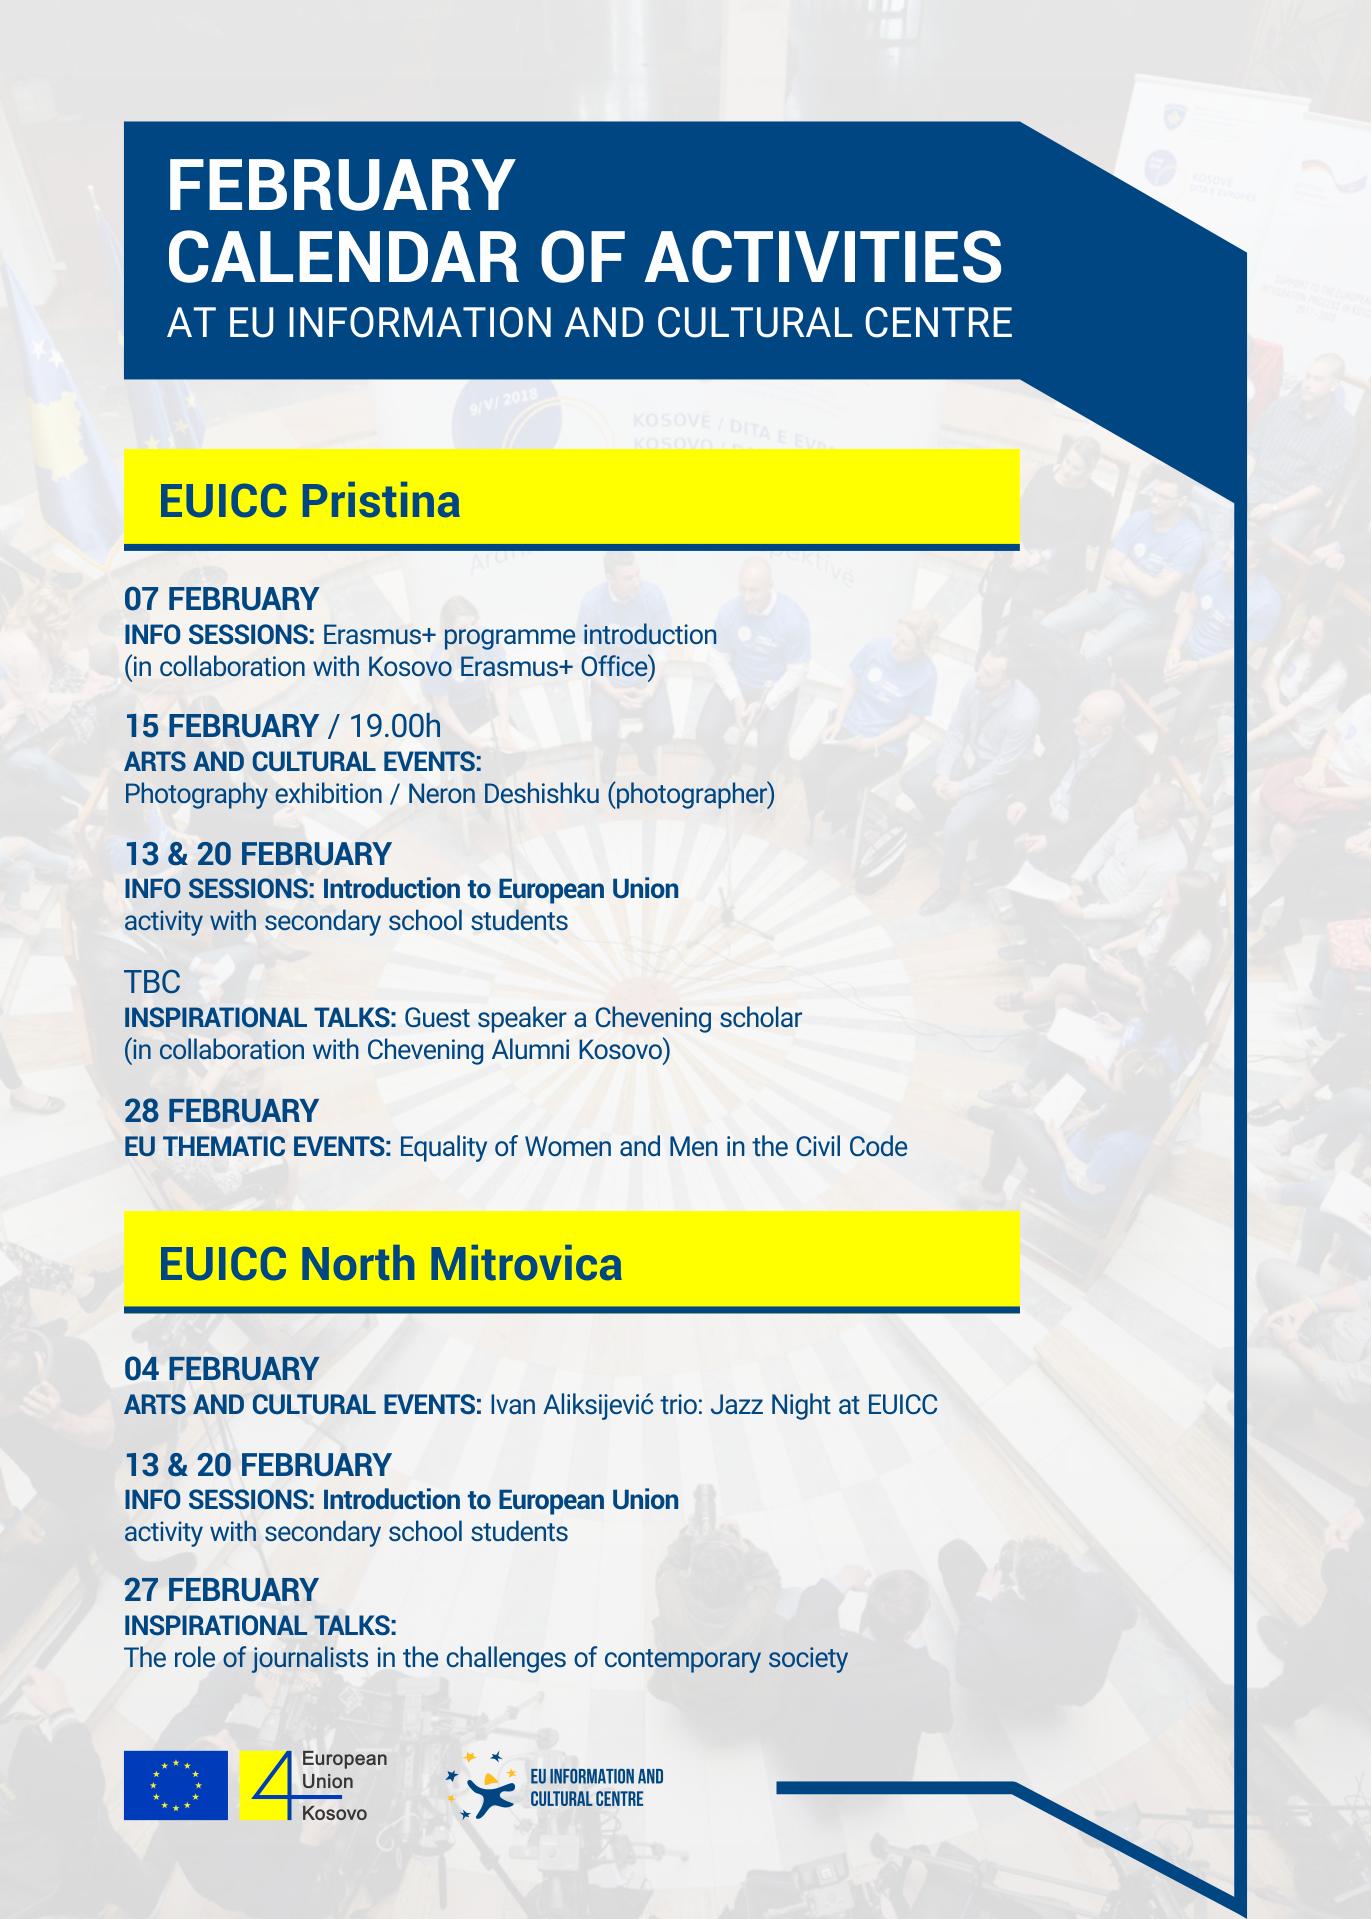 EUICC_CALENDAR_february